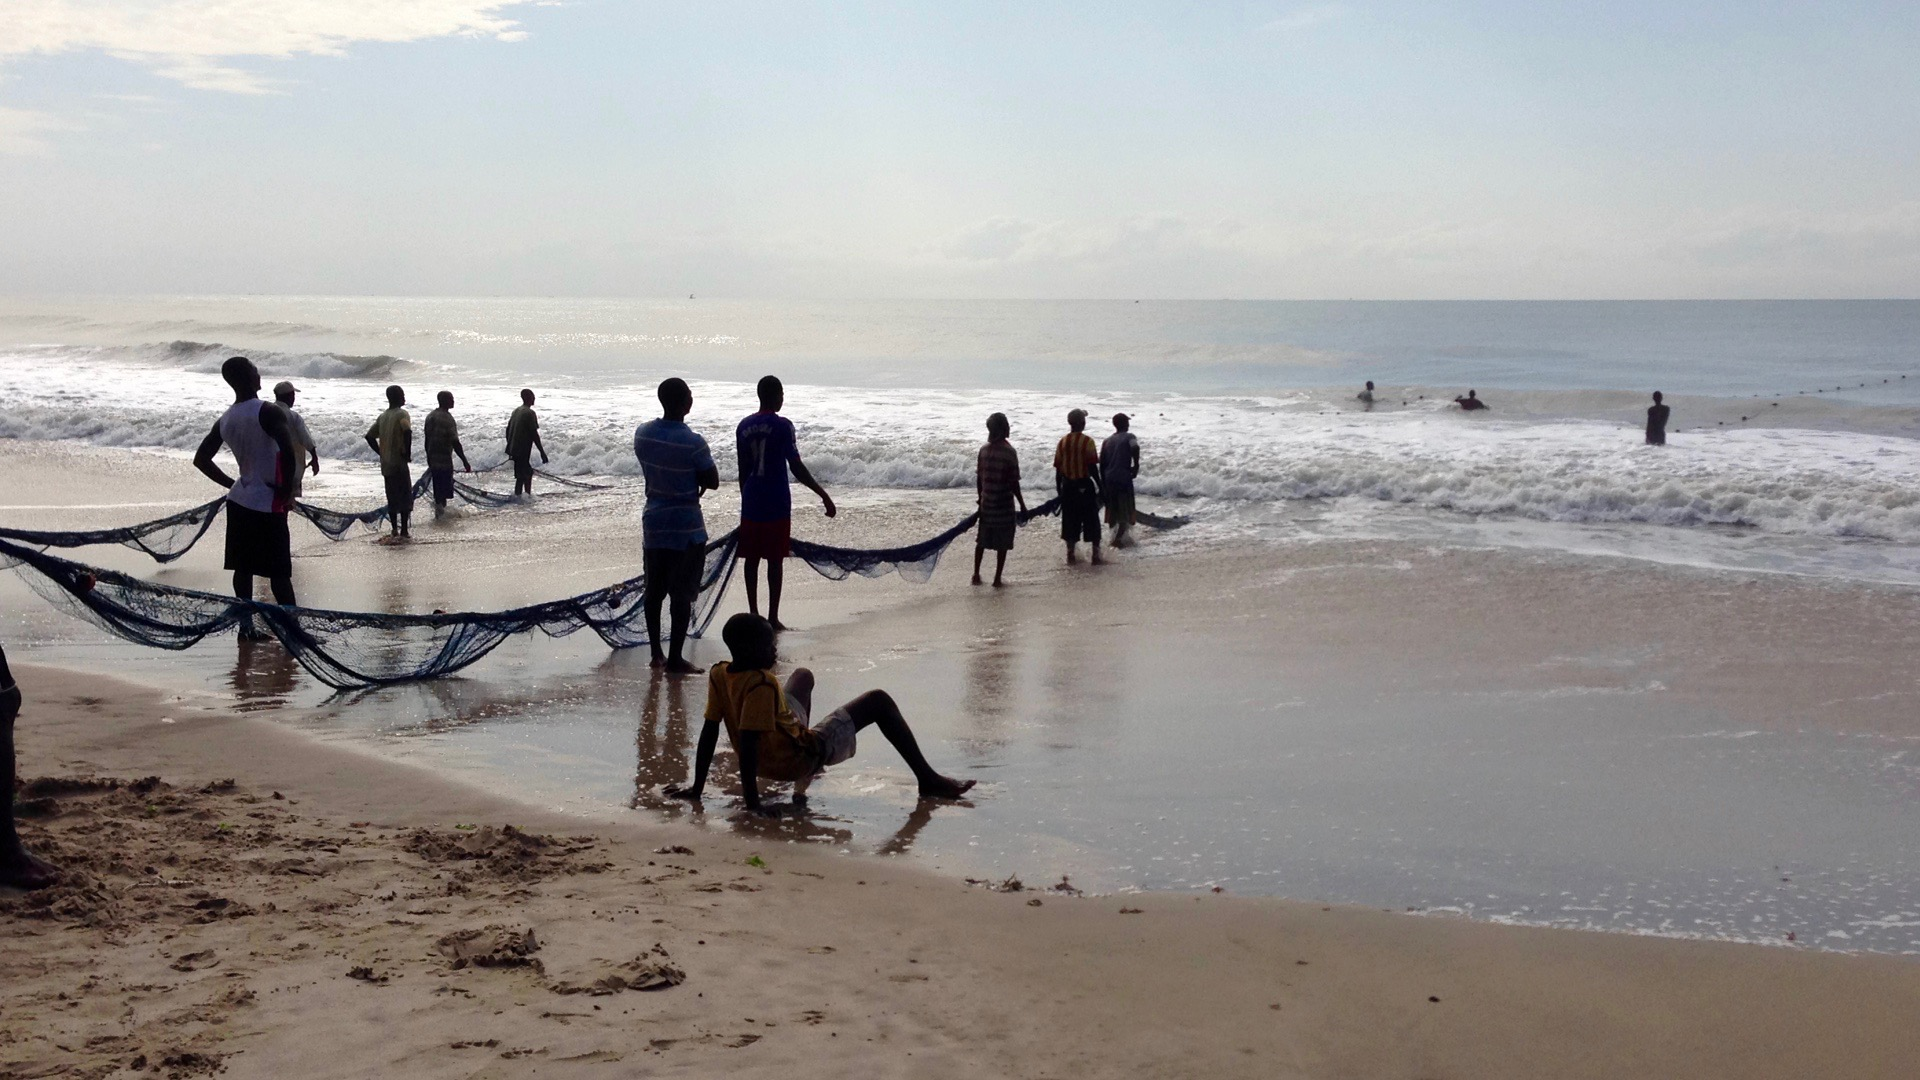 Seine fishing in Kokrobite beach fishing village, Ghana. #JujuFilms